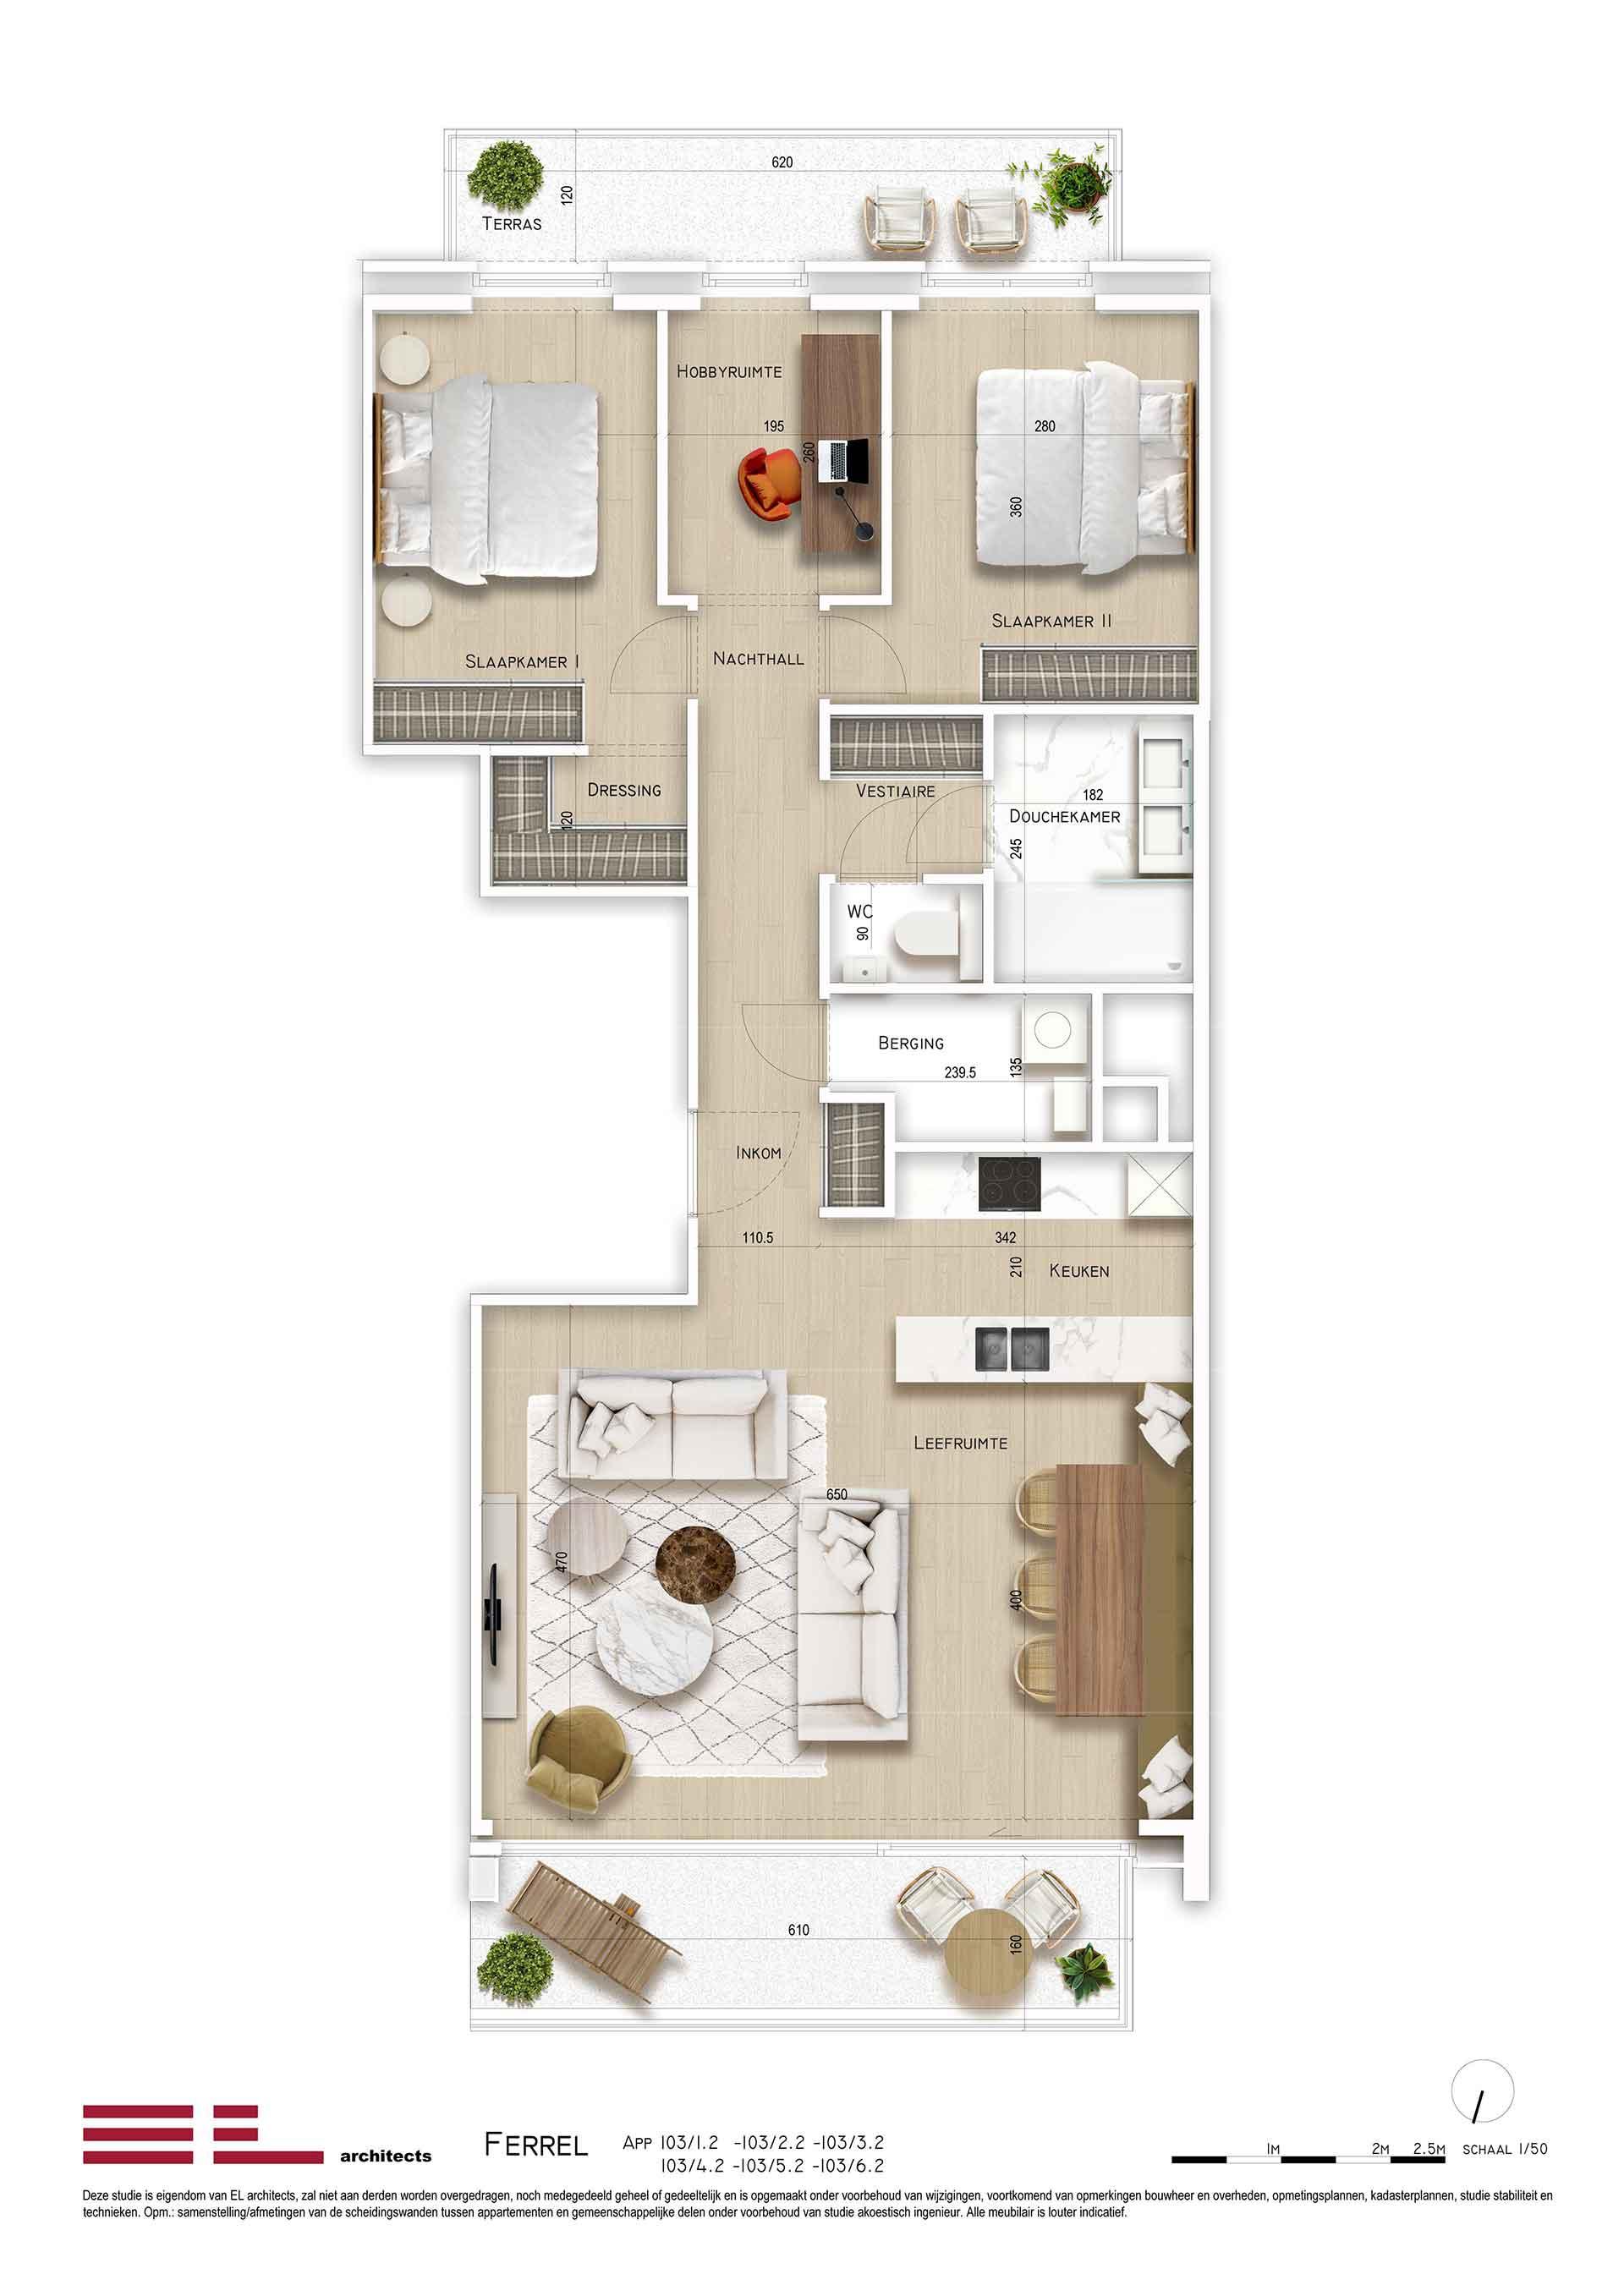 Residentie <br/> Ferrel - image appartement-te-koop-sint-idesbald-residentie-ferrel-appartement-type2 on https://hoprom.be